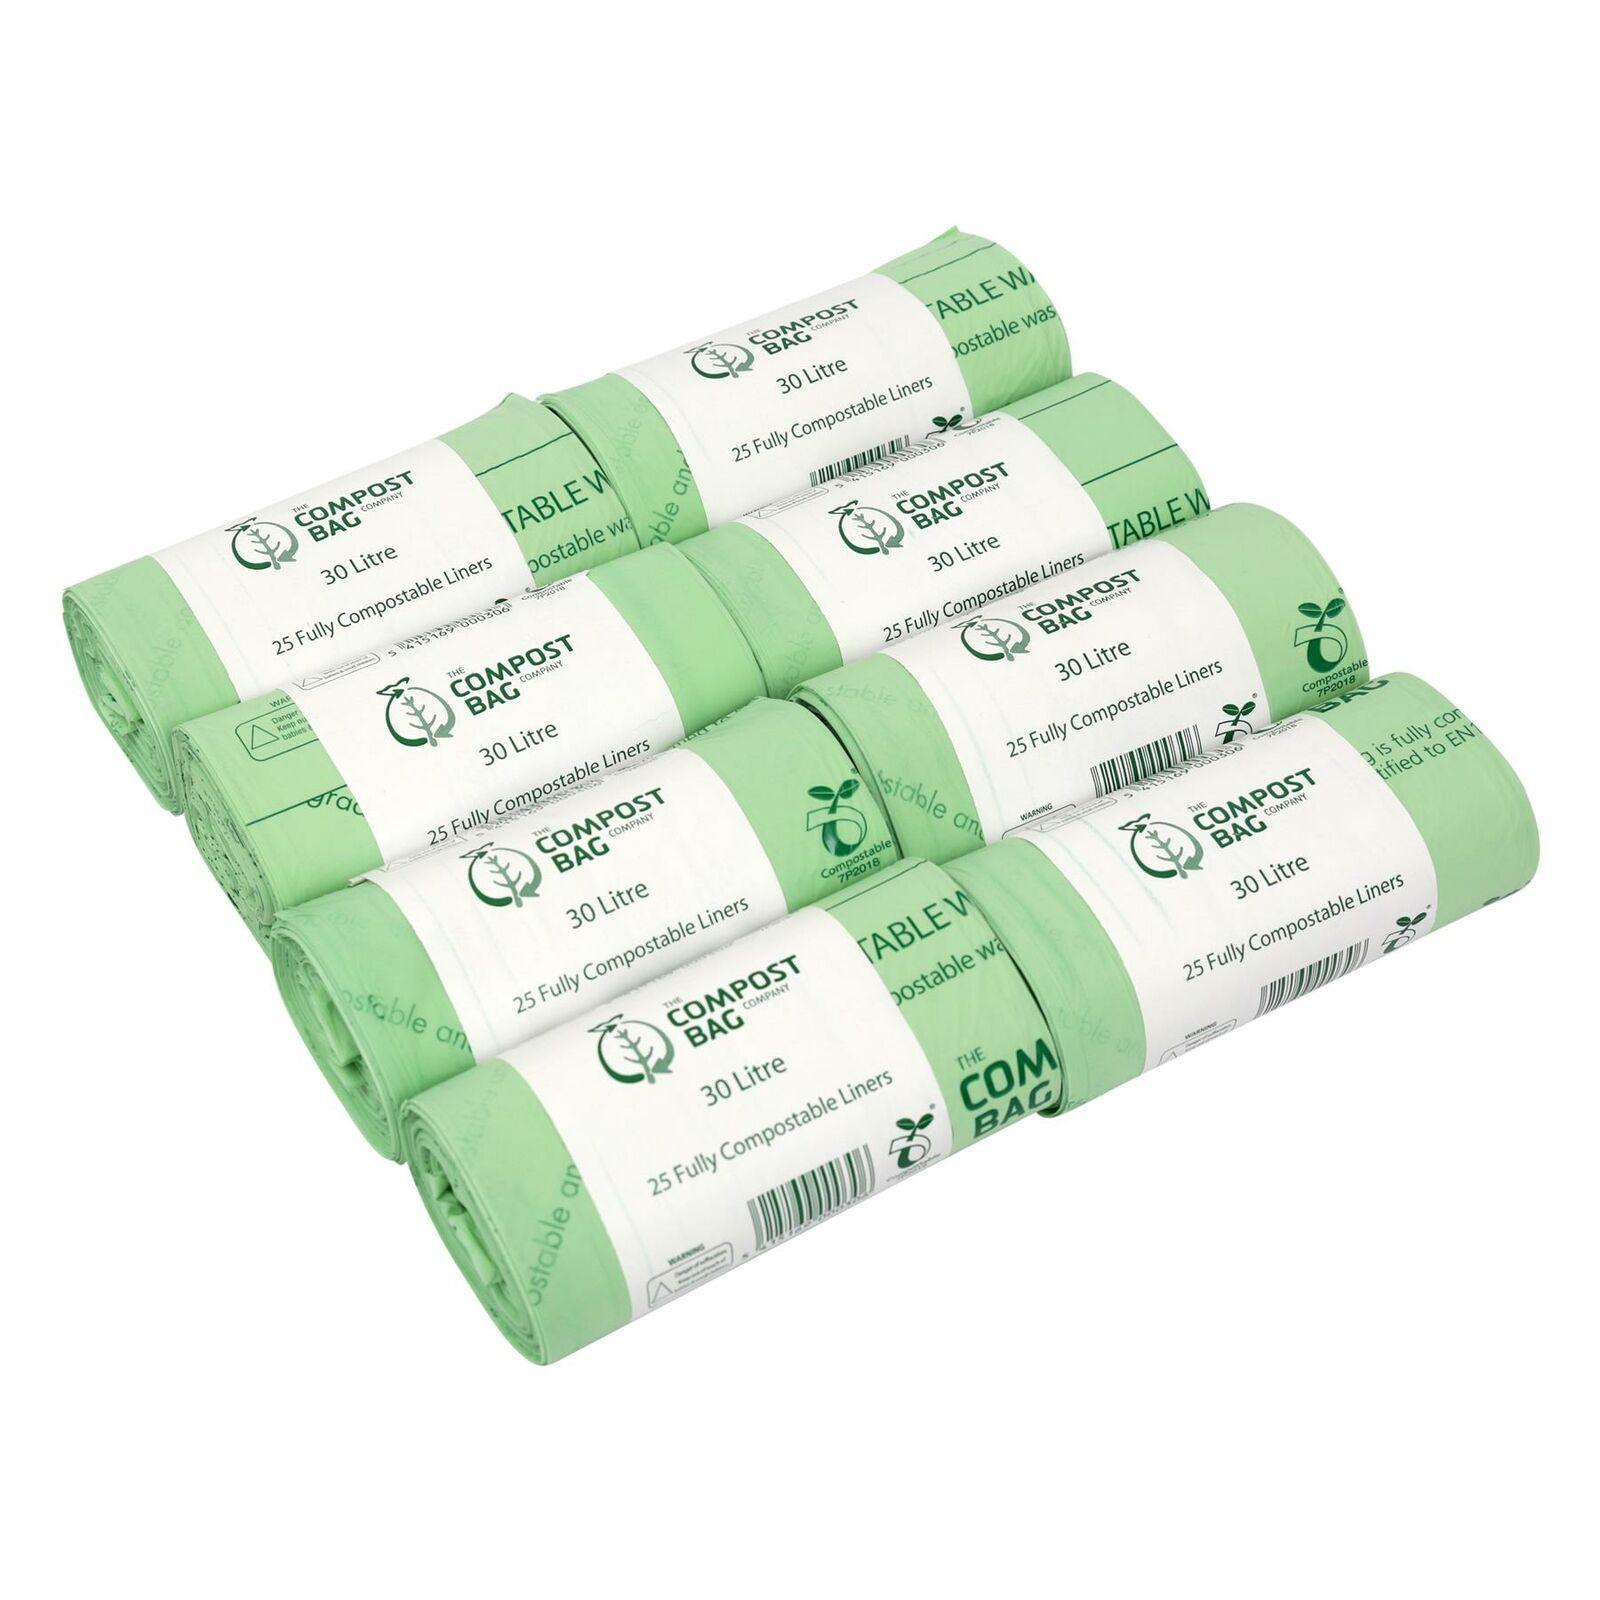 200 x 30L Compost Bag Compostable Kitchen Caddy Waste Liners - bags EN13432